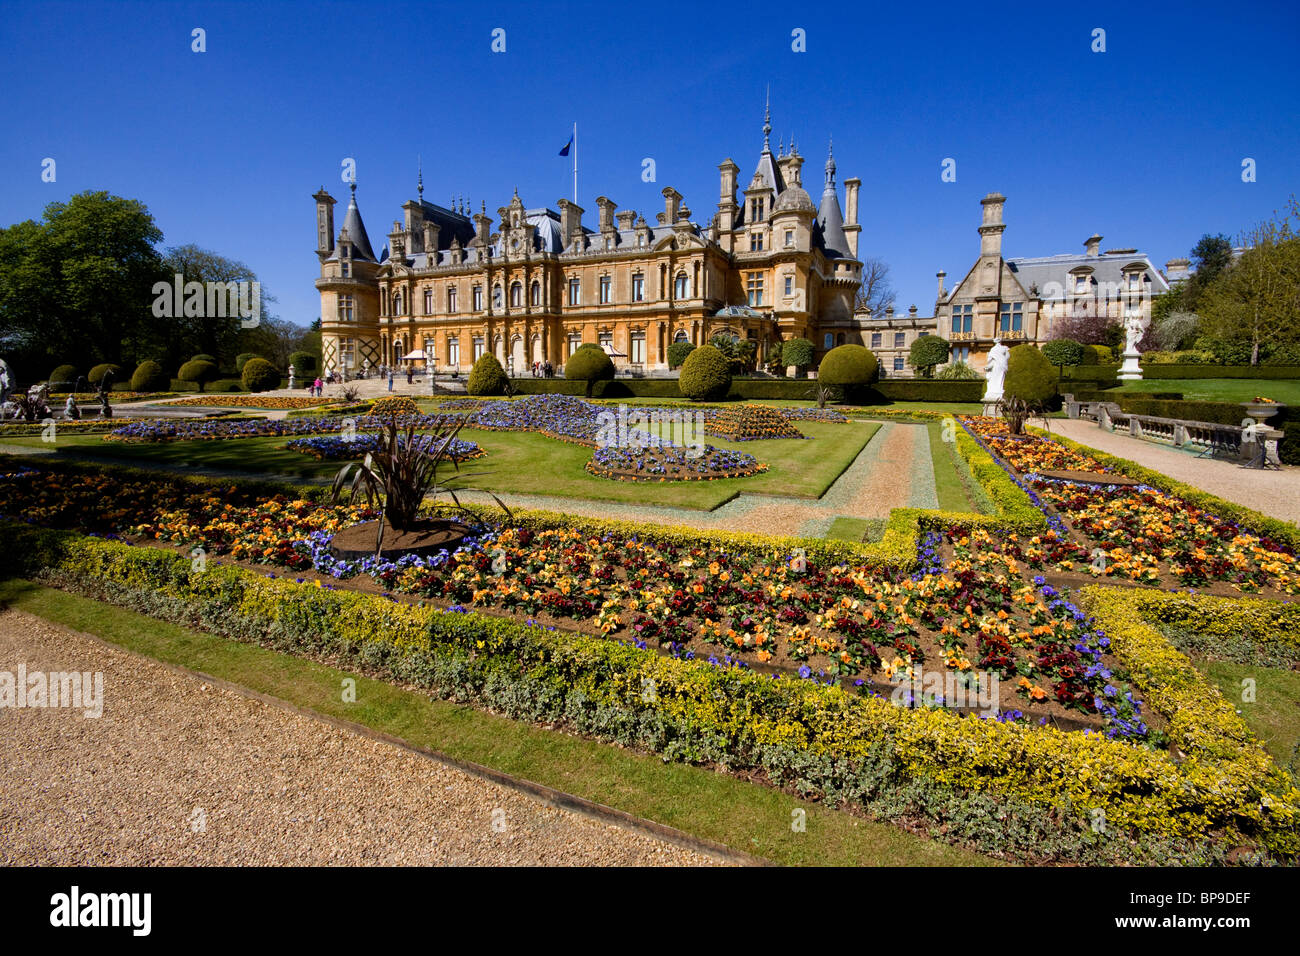 Waddesden Manor Buckinghamshire chateau stately home Rothschild - Stock Image